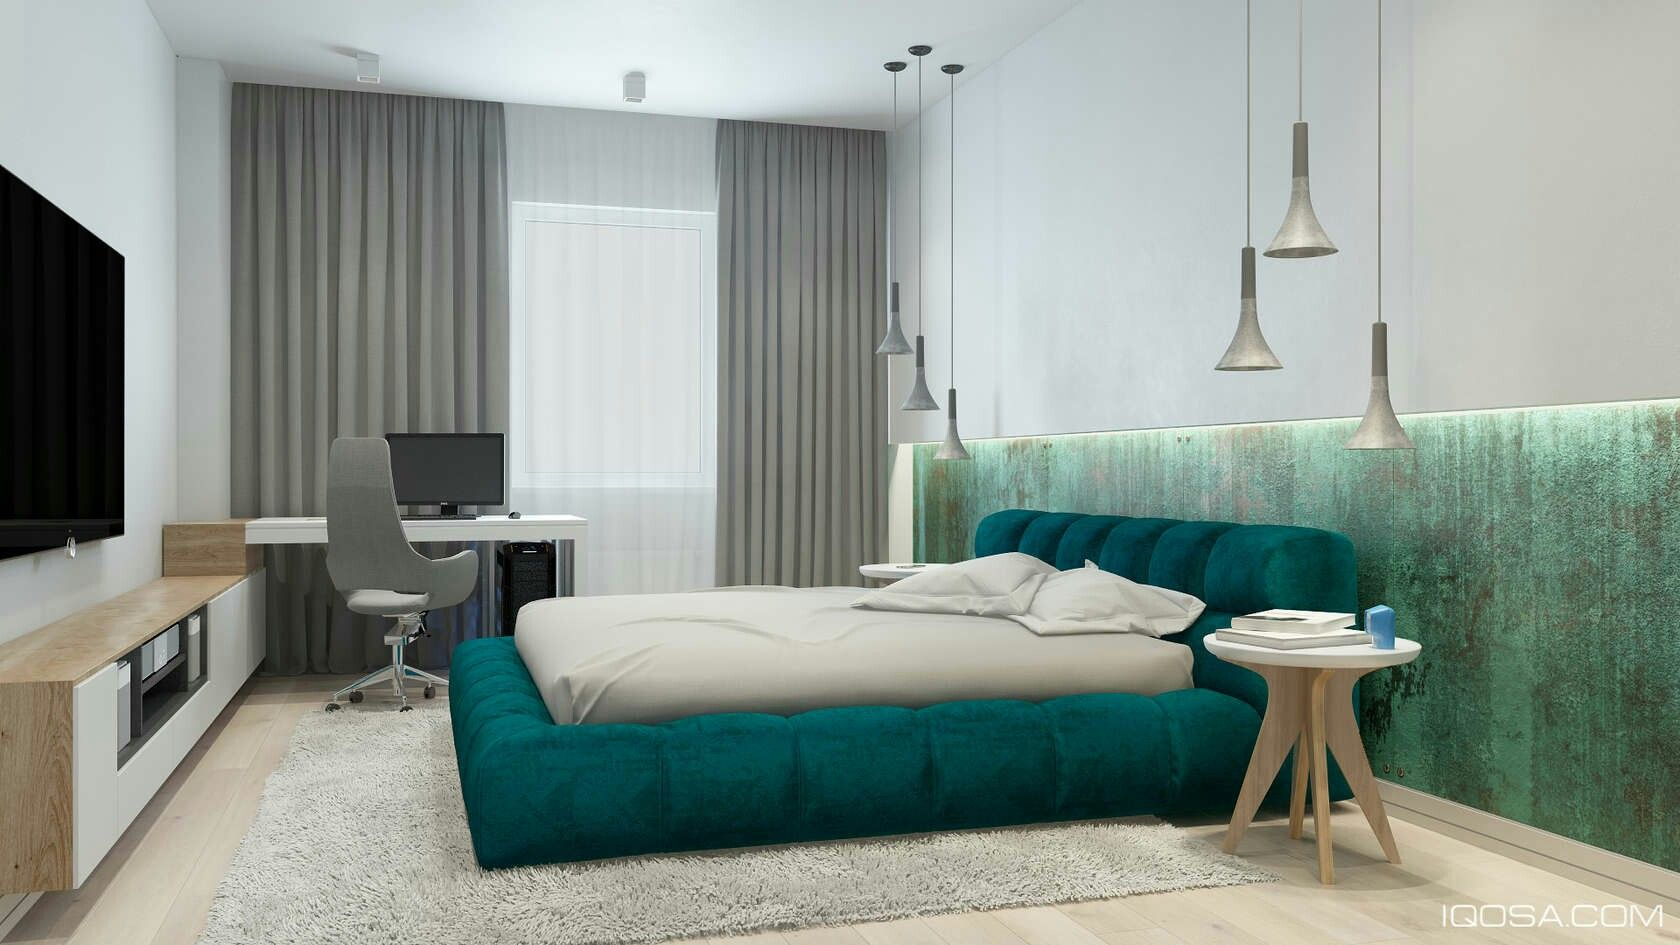 Master Bedroom Minimalist Design Enchanting Pinemia Tommillo On Casa  Pinterest Design Ideas